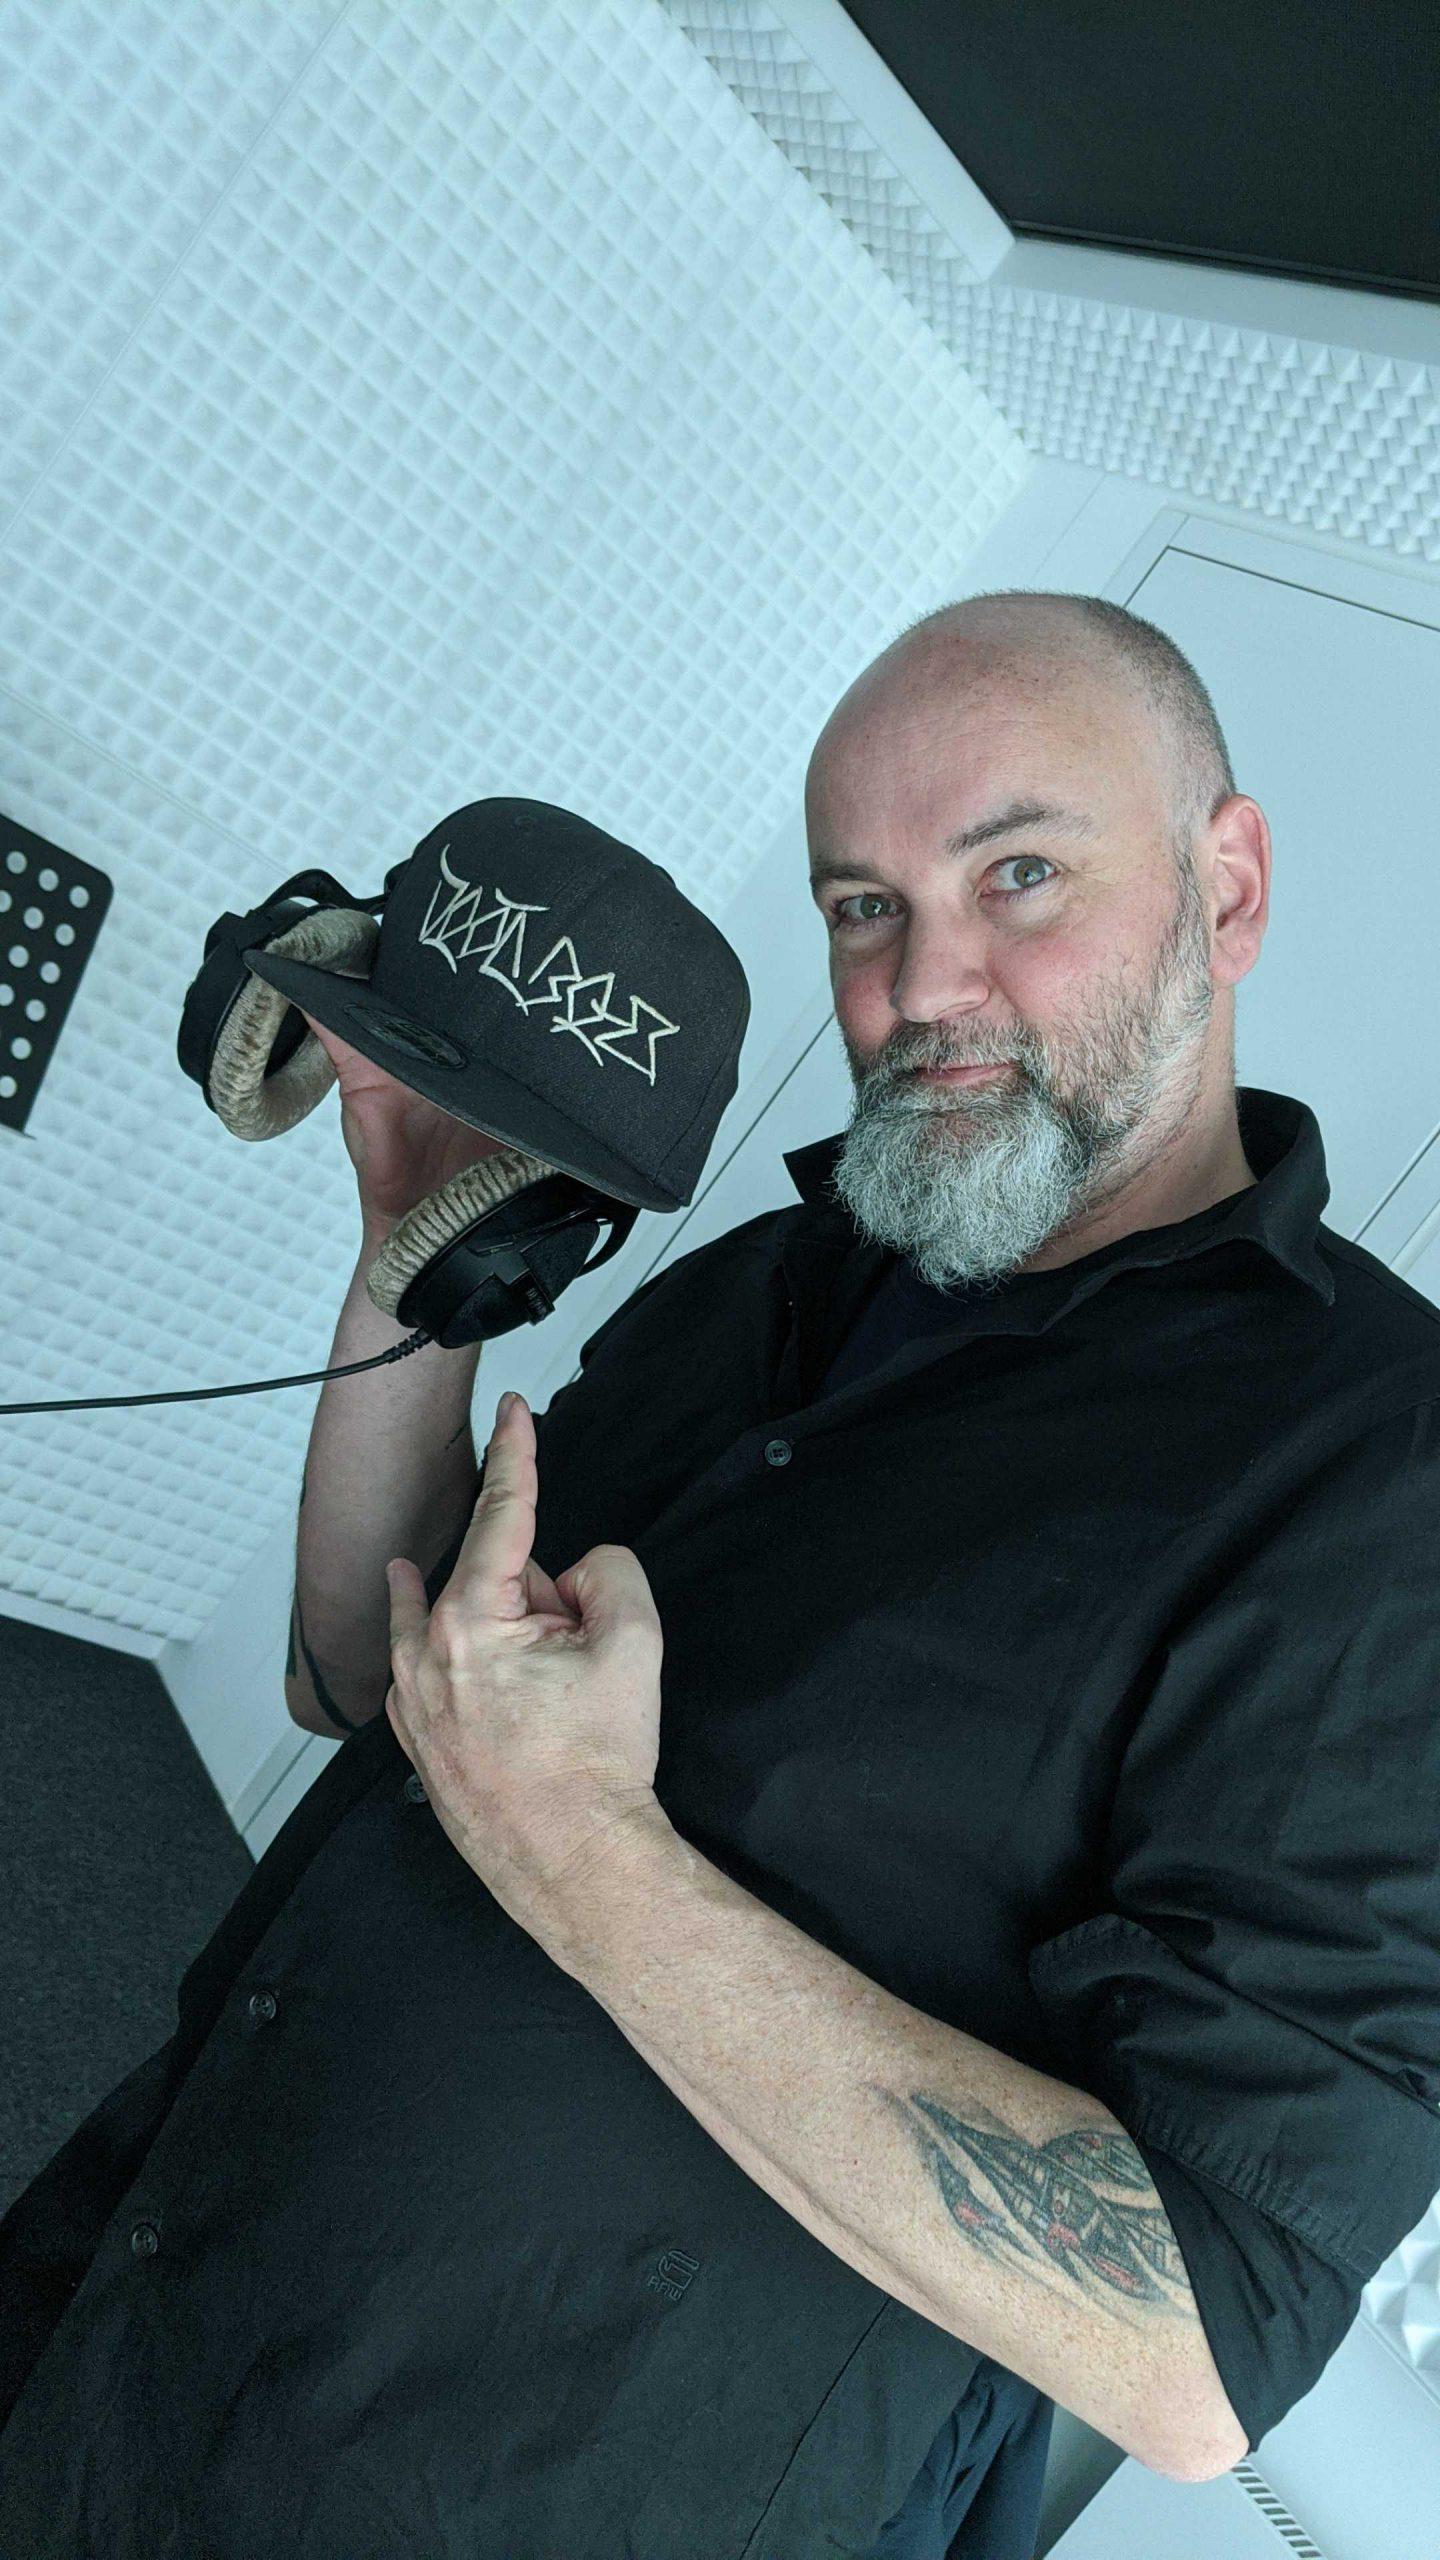 Redakteur Matz Kastning mit Kopfhörern im Radiostudio